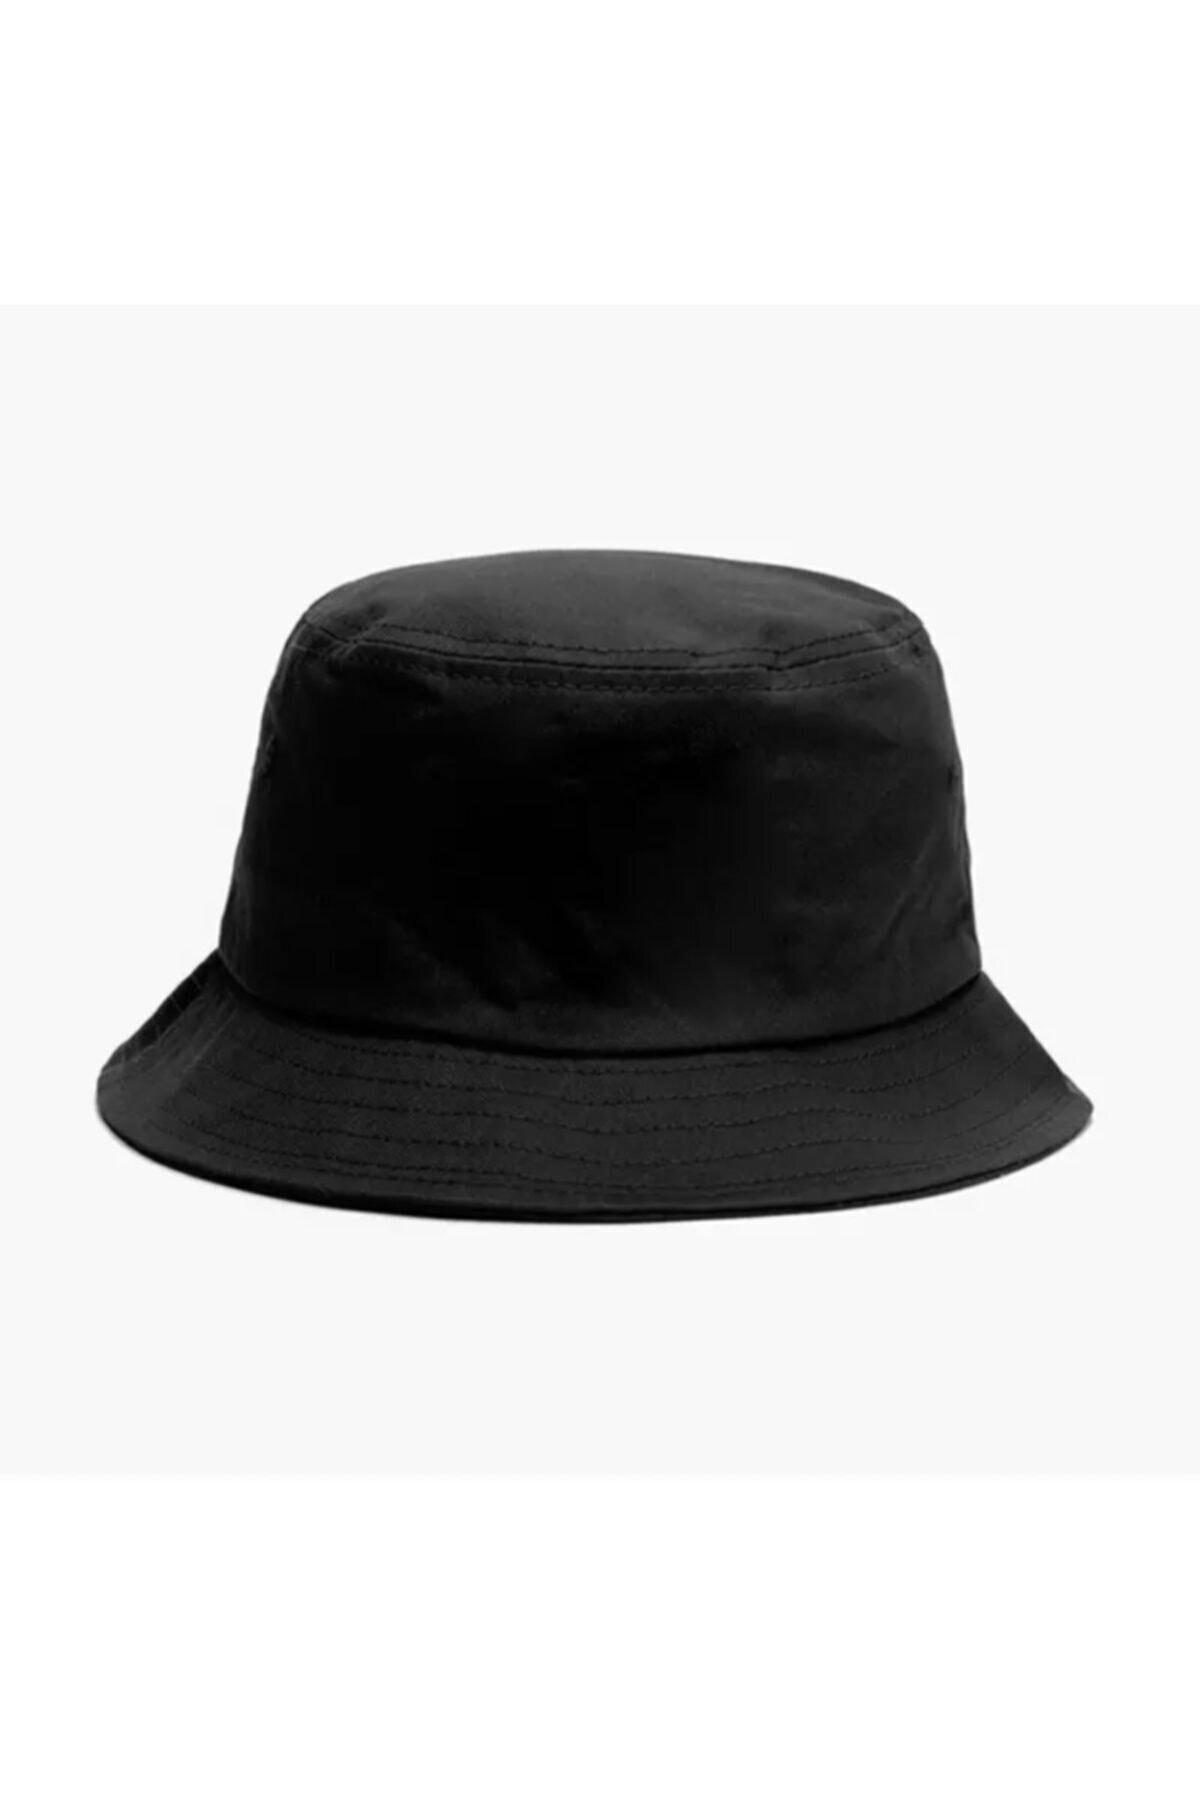 کلاه مردانه فروش برند Köstebek رنگ مشکی کد ty41187919